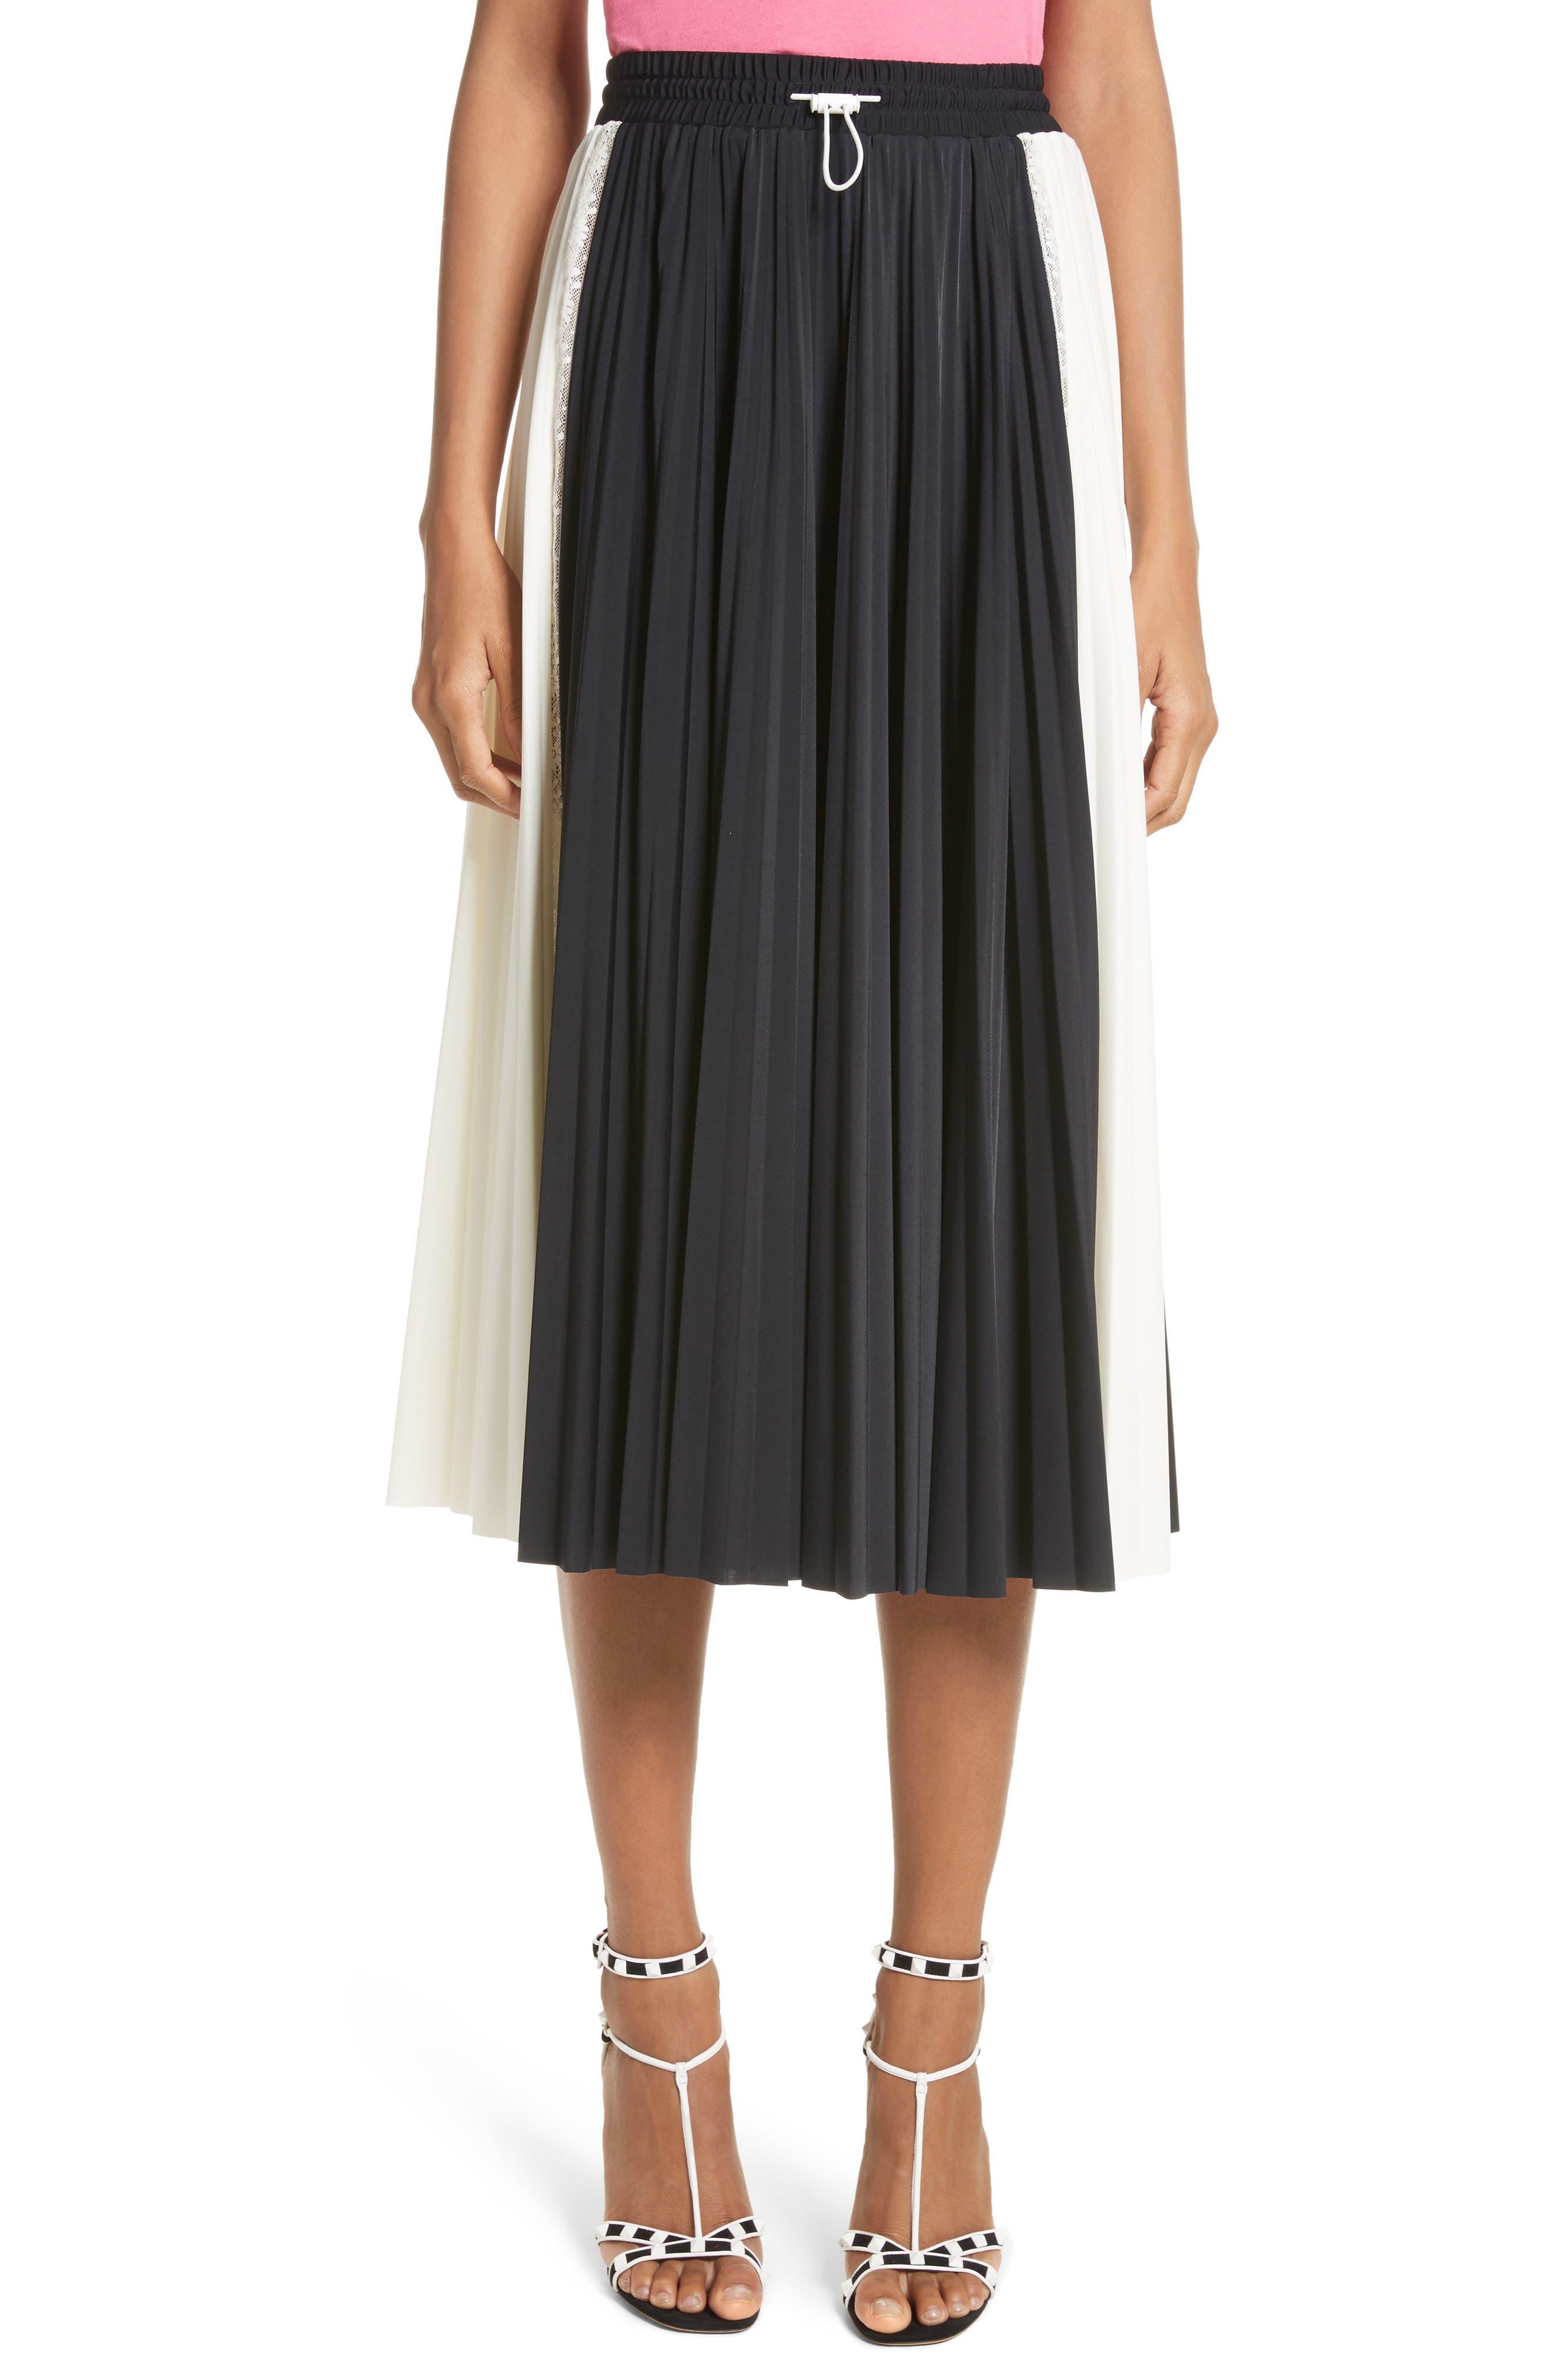 Valentino Bicolor Jersey & Lace Plissé Skirt